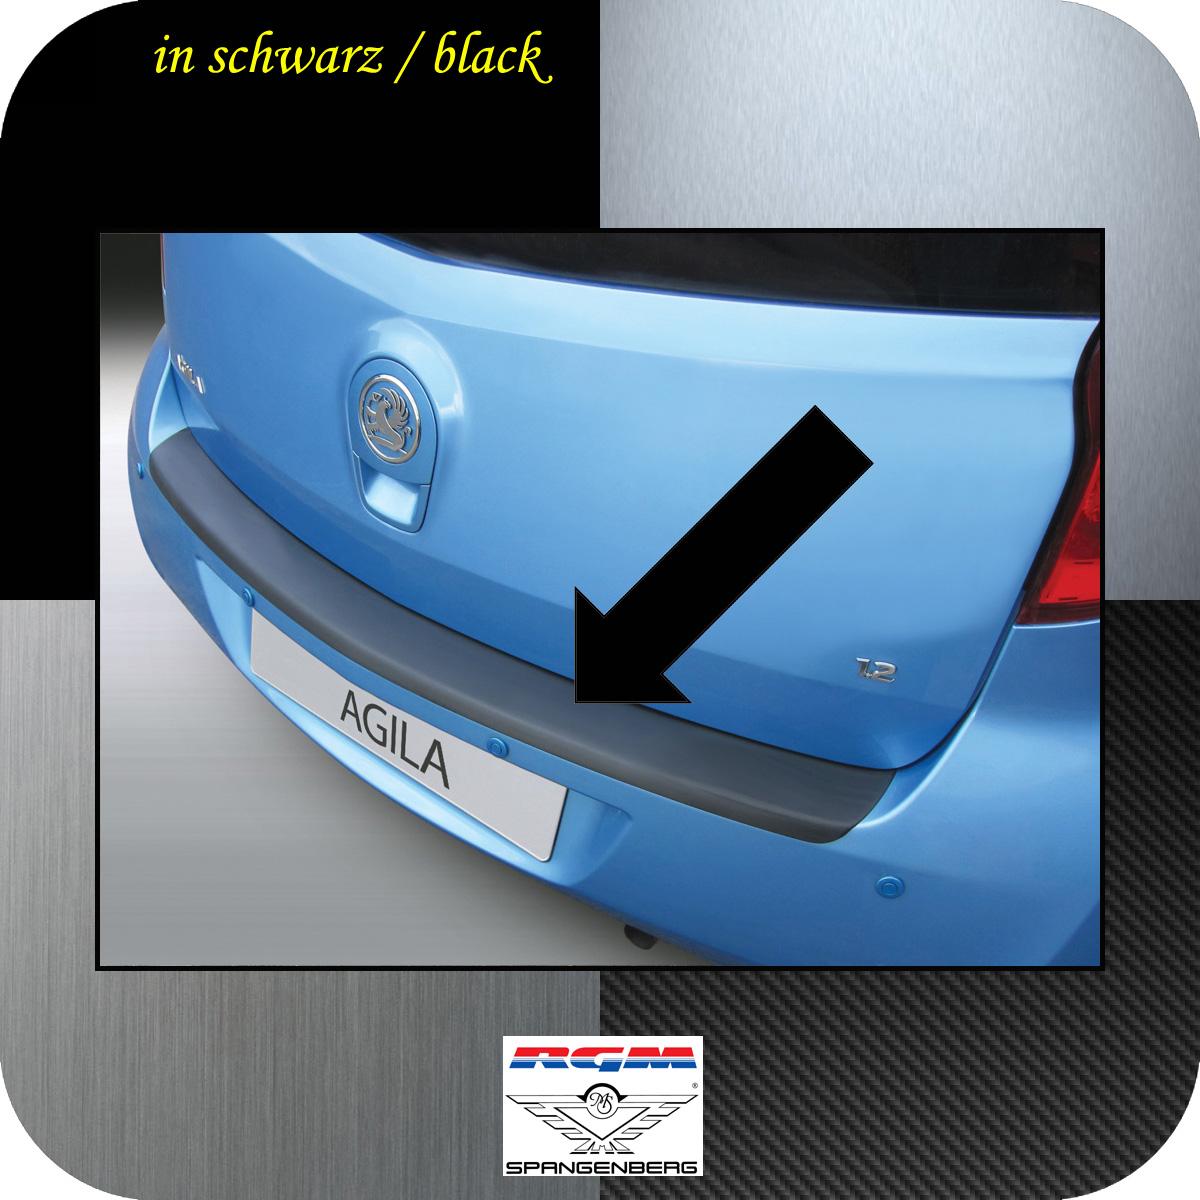 Ladekantenschutz schwarz Opel Agila B Minivan Baujahre 03.2008-06.2015 3500994